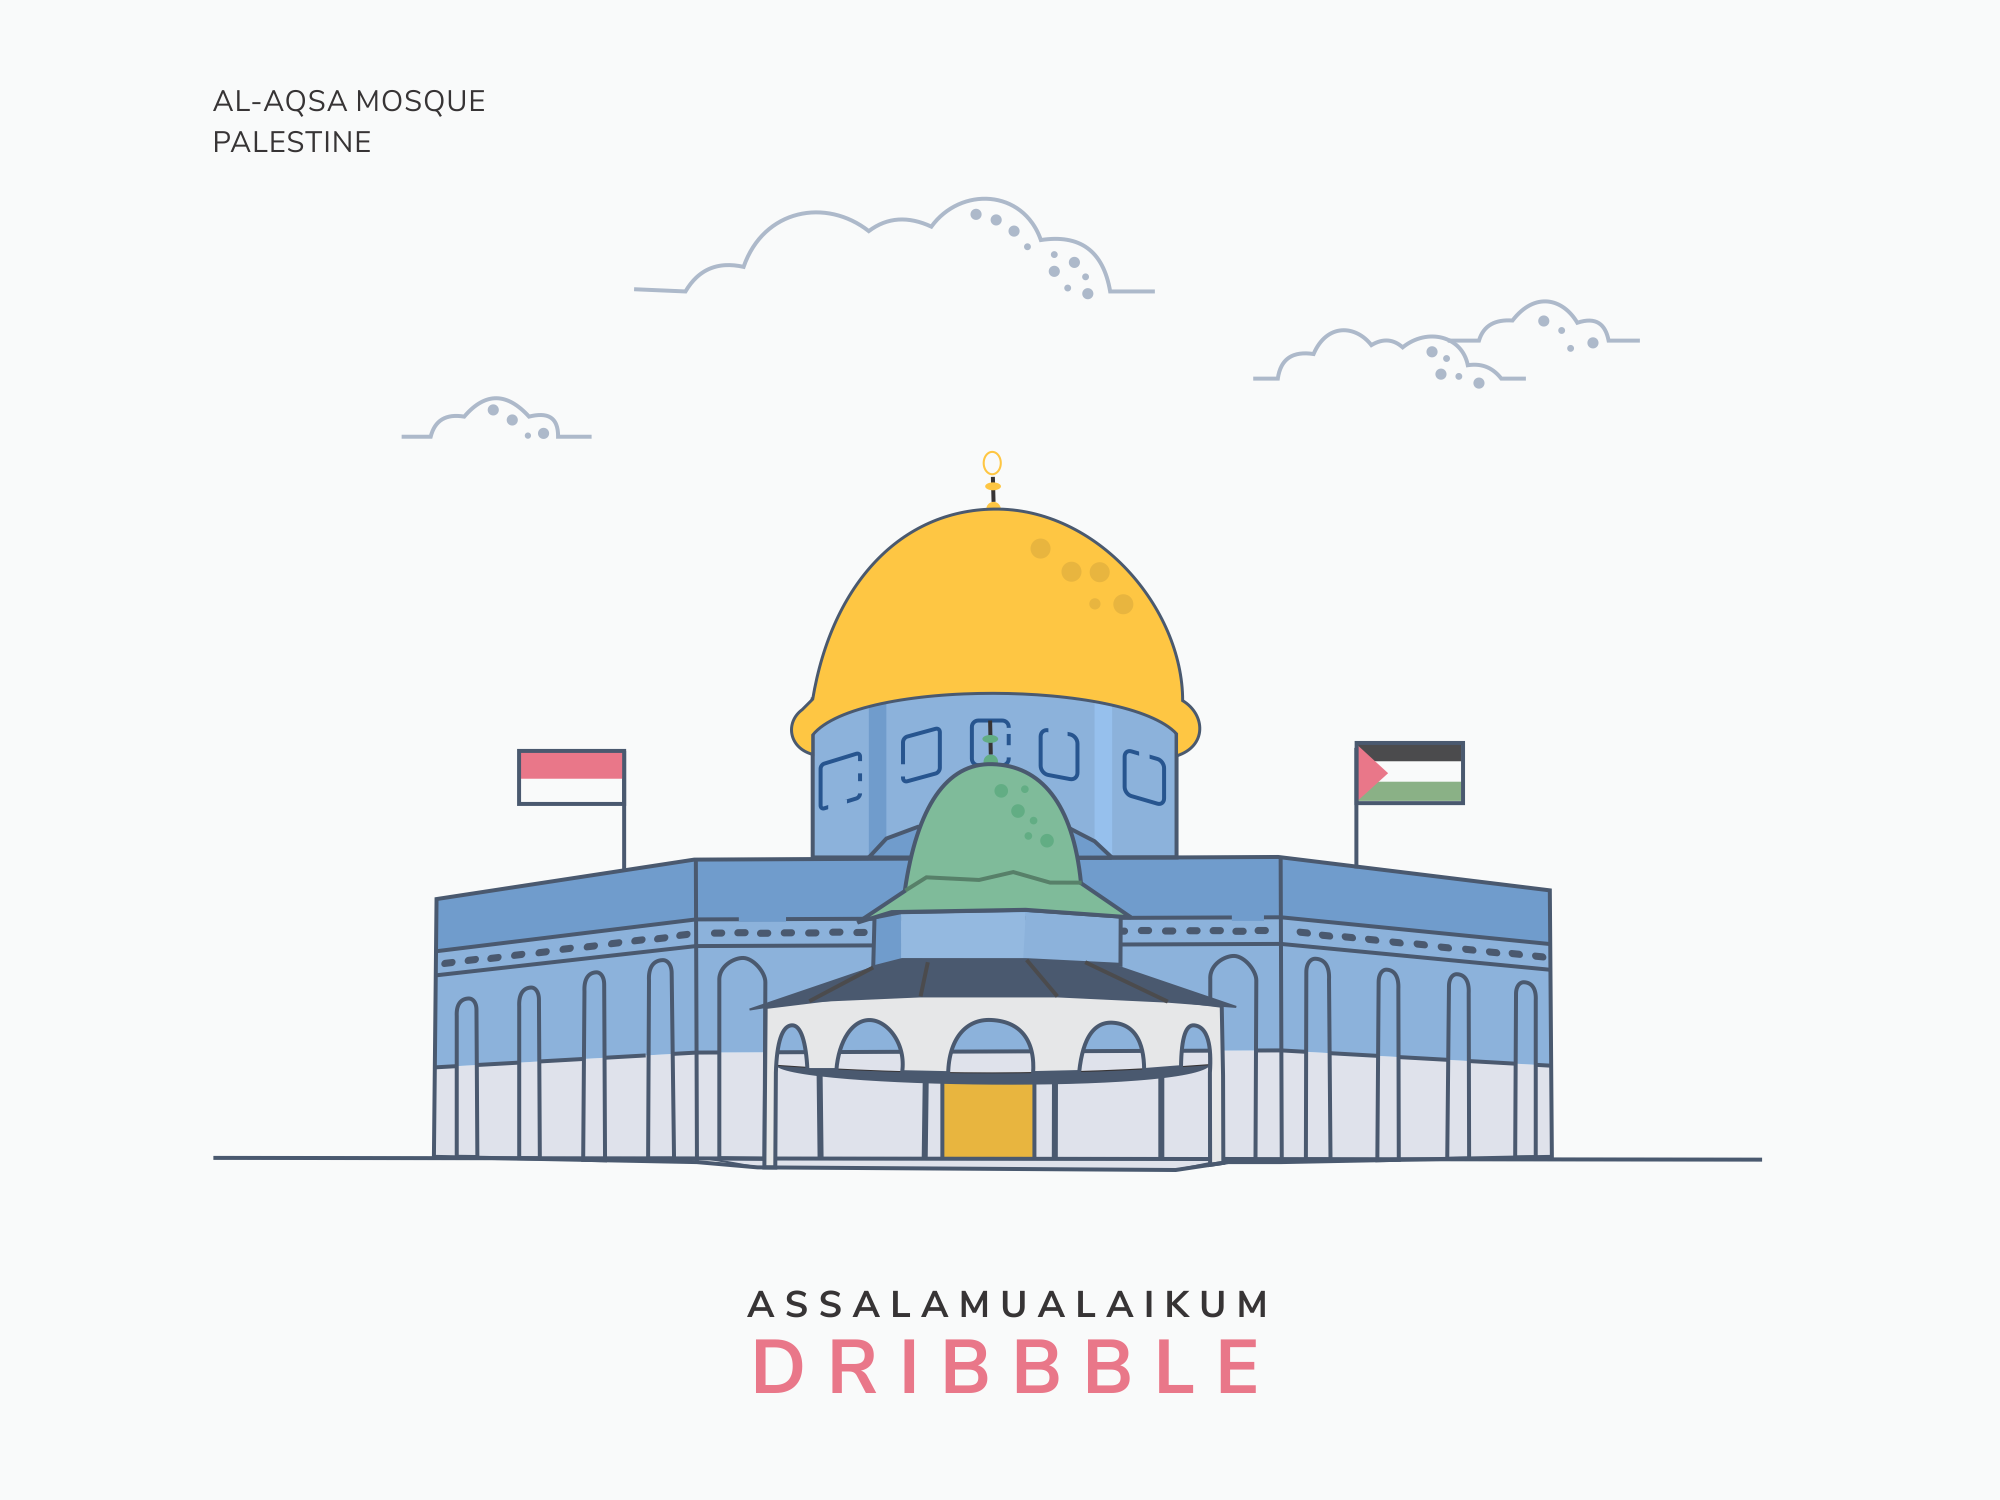 Al Aqsa Mosque Palestine By Imam Sutono On Dribbble